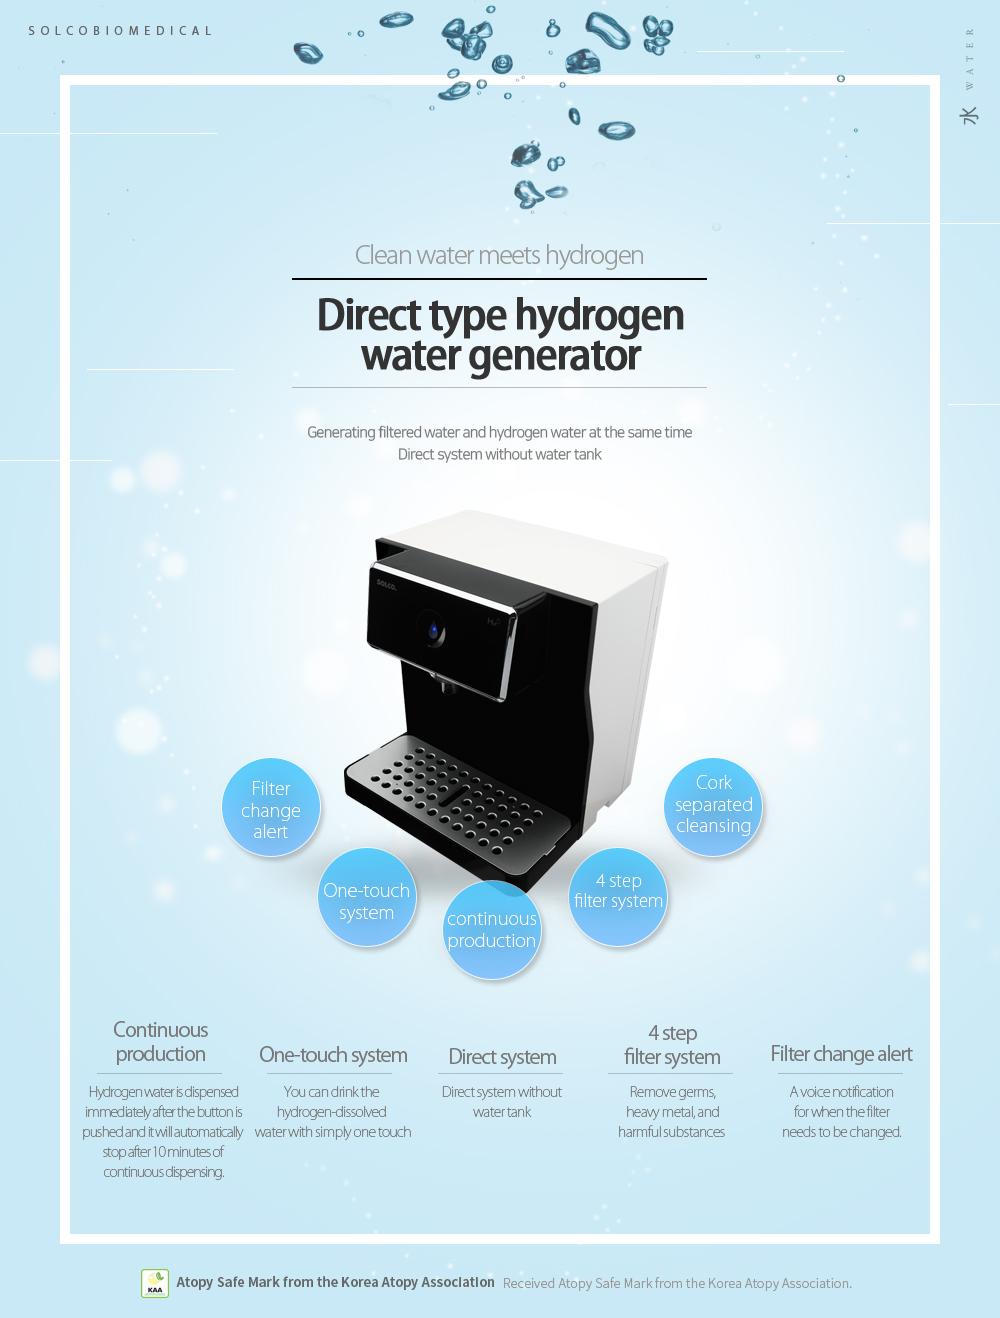 SOLCO BIOMEDICA Direct Type Hydrogen Water Generator